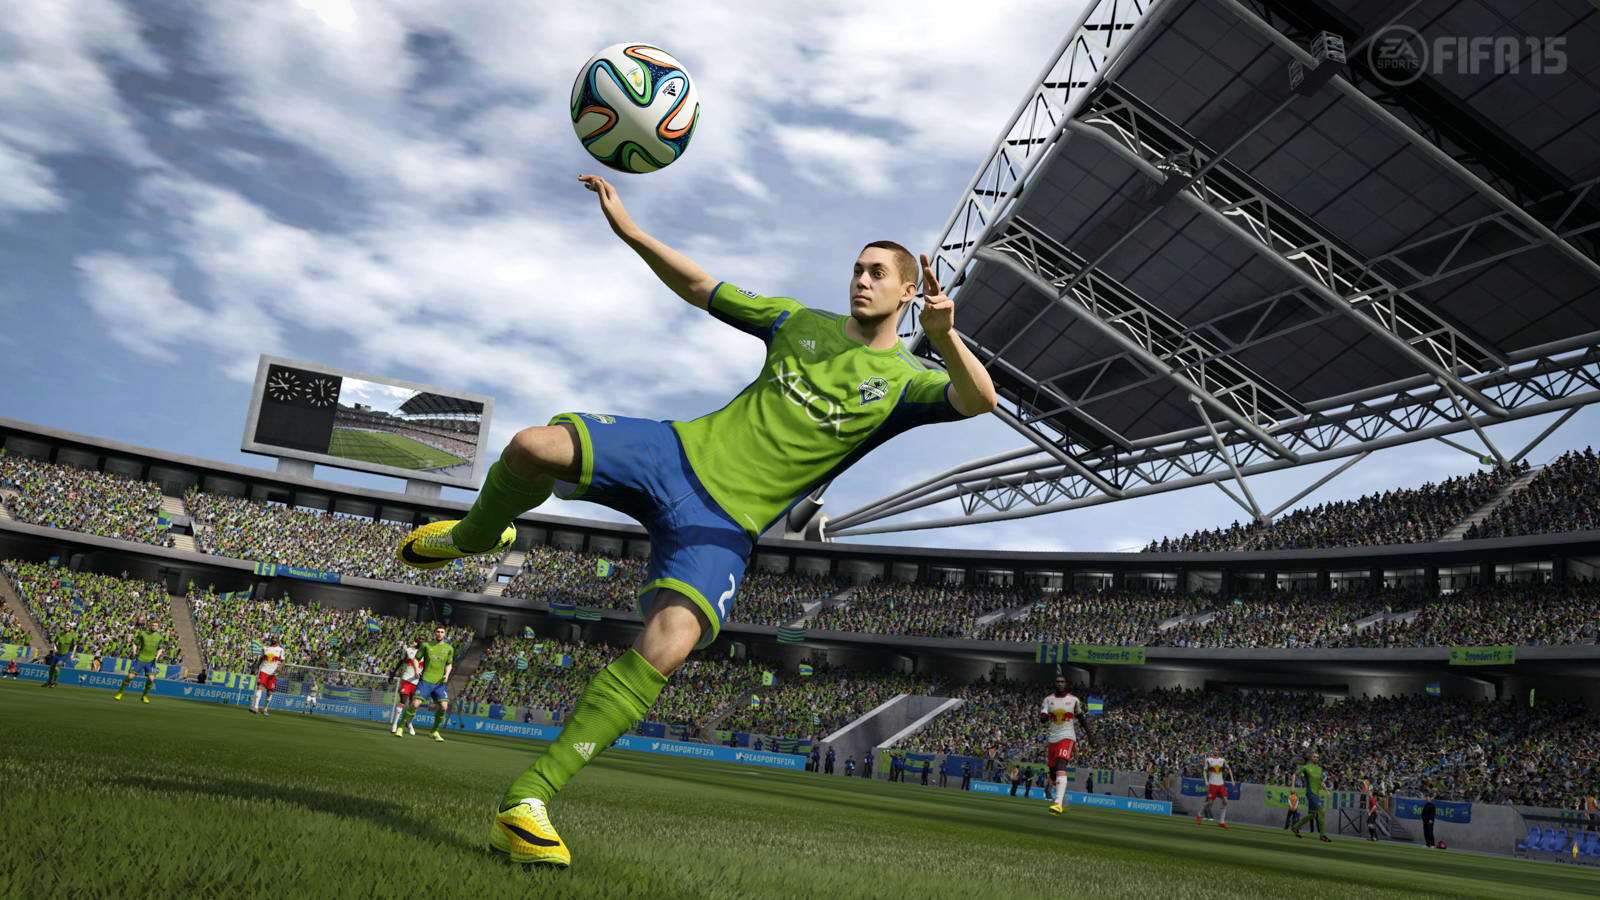 FIFA15最新游戏截图赏 高清画质令人期待